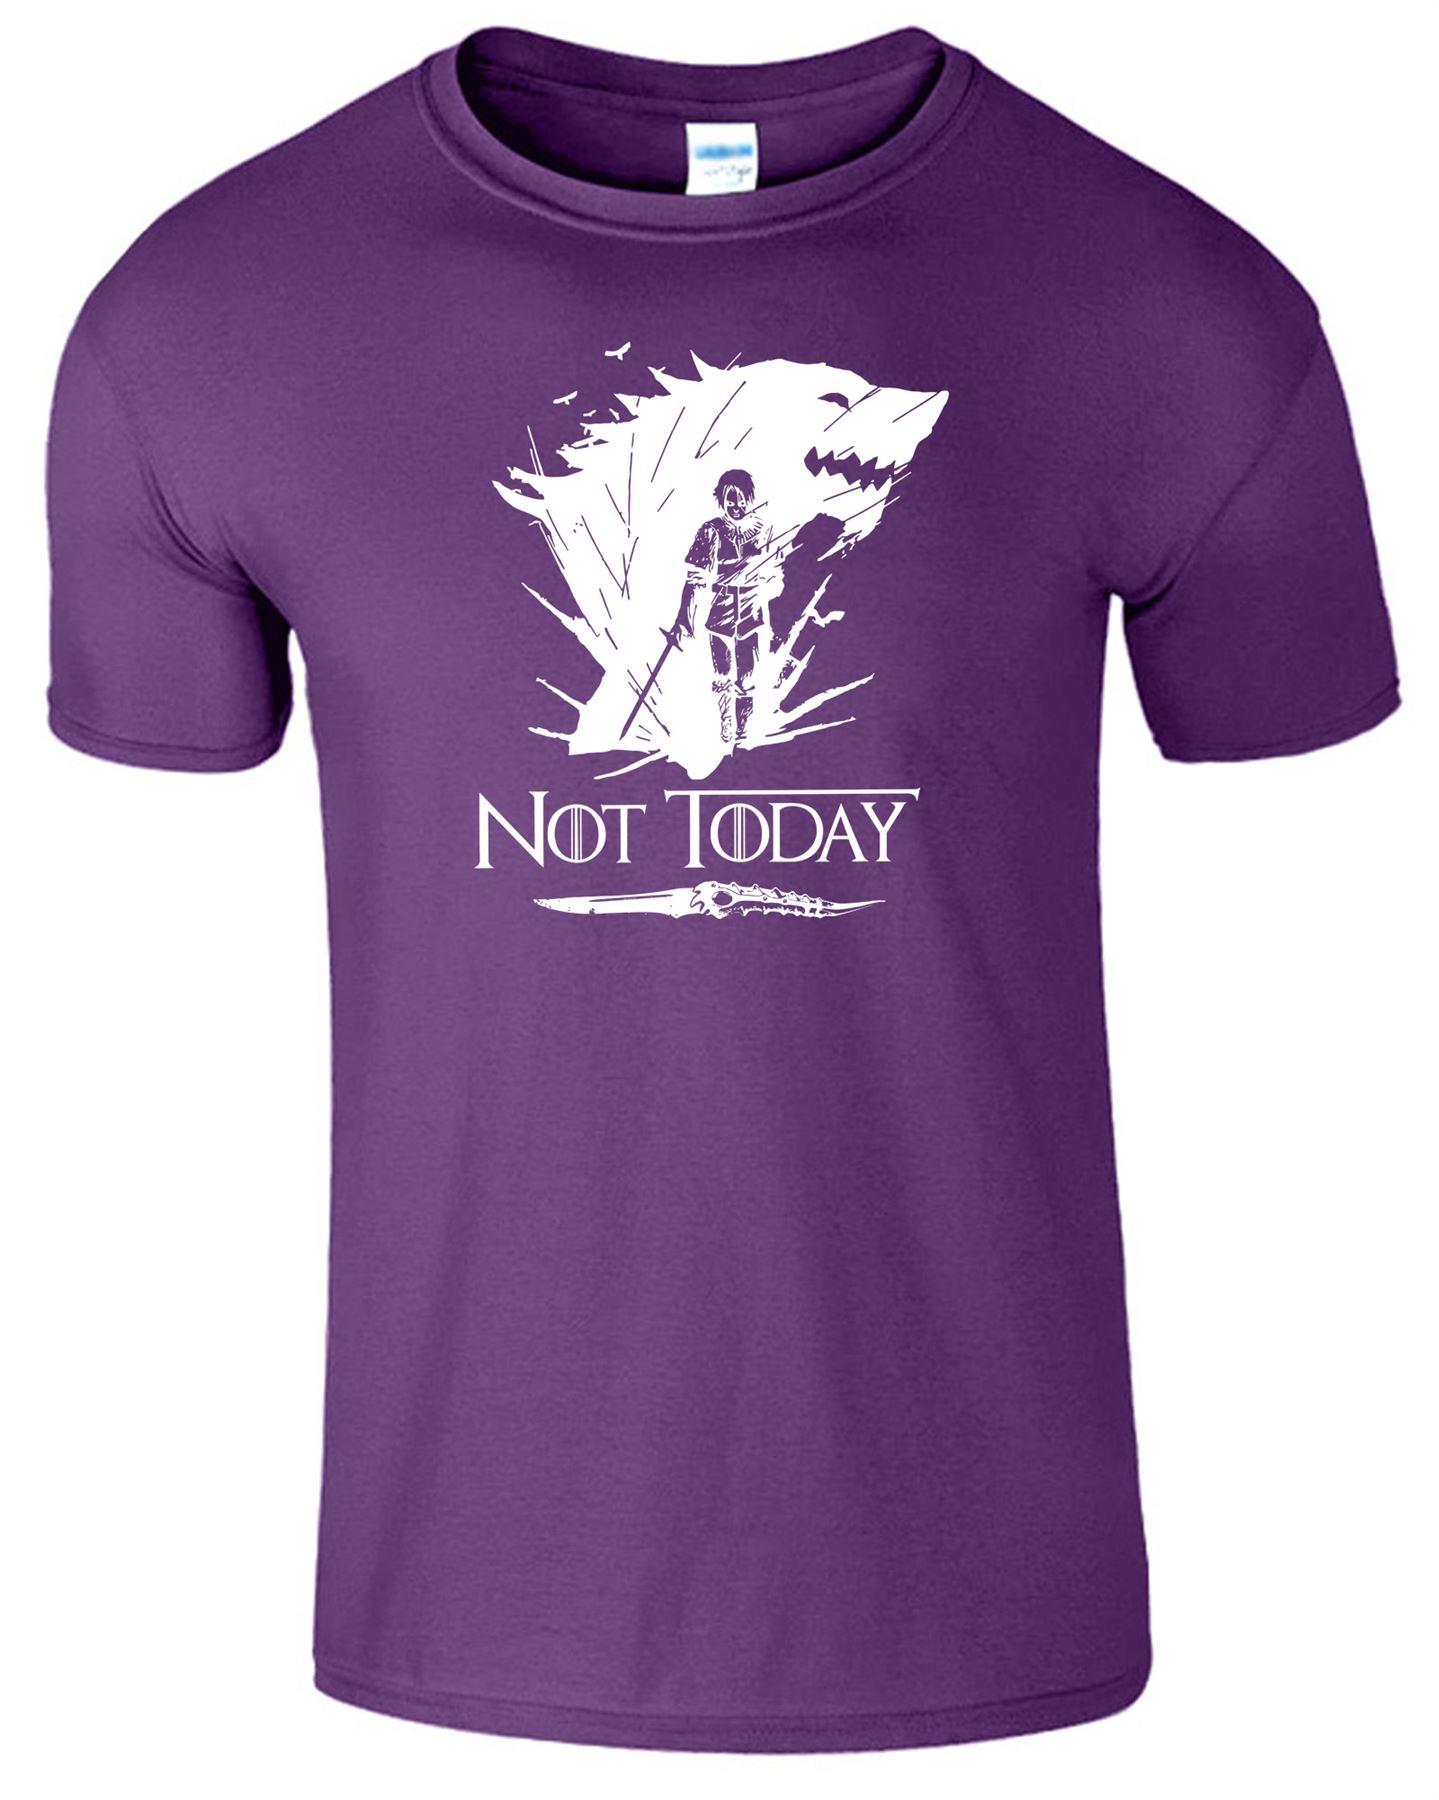 Arya-Stark-Not-Today-T-Shirt-Mens-Game-Season-Womens-Shirt-Adults-Unisex-Fit Indexbild 37